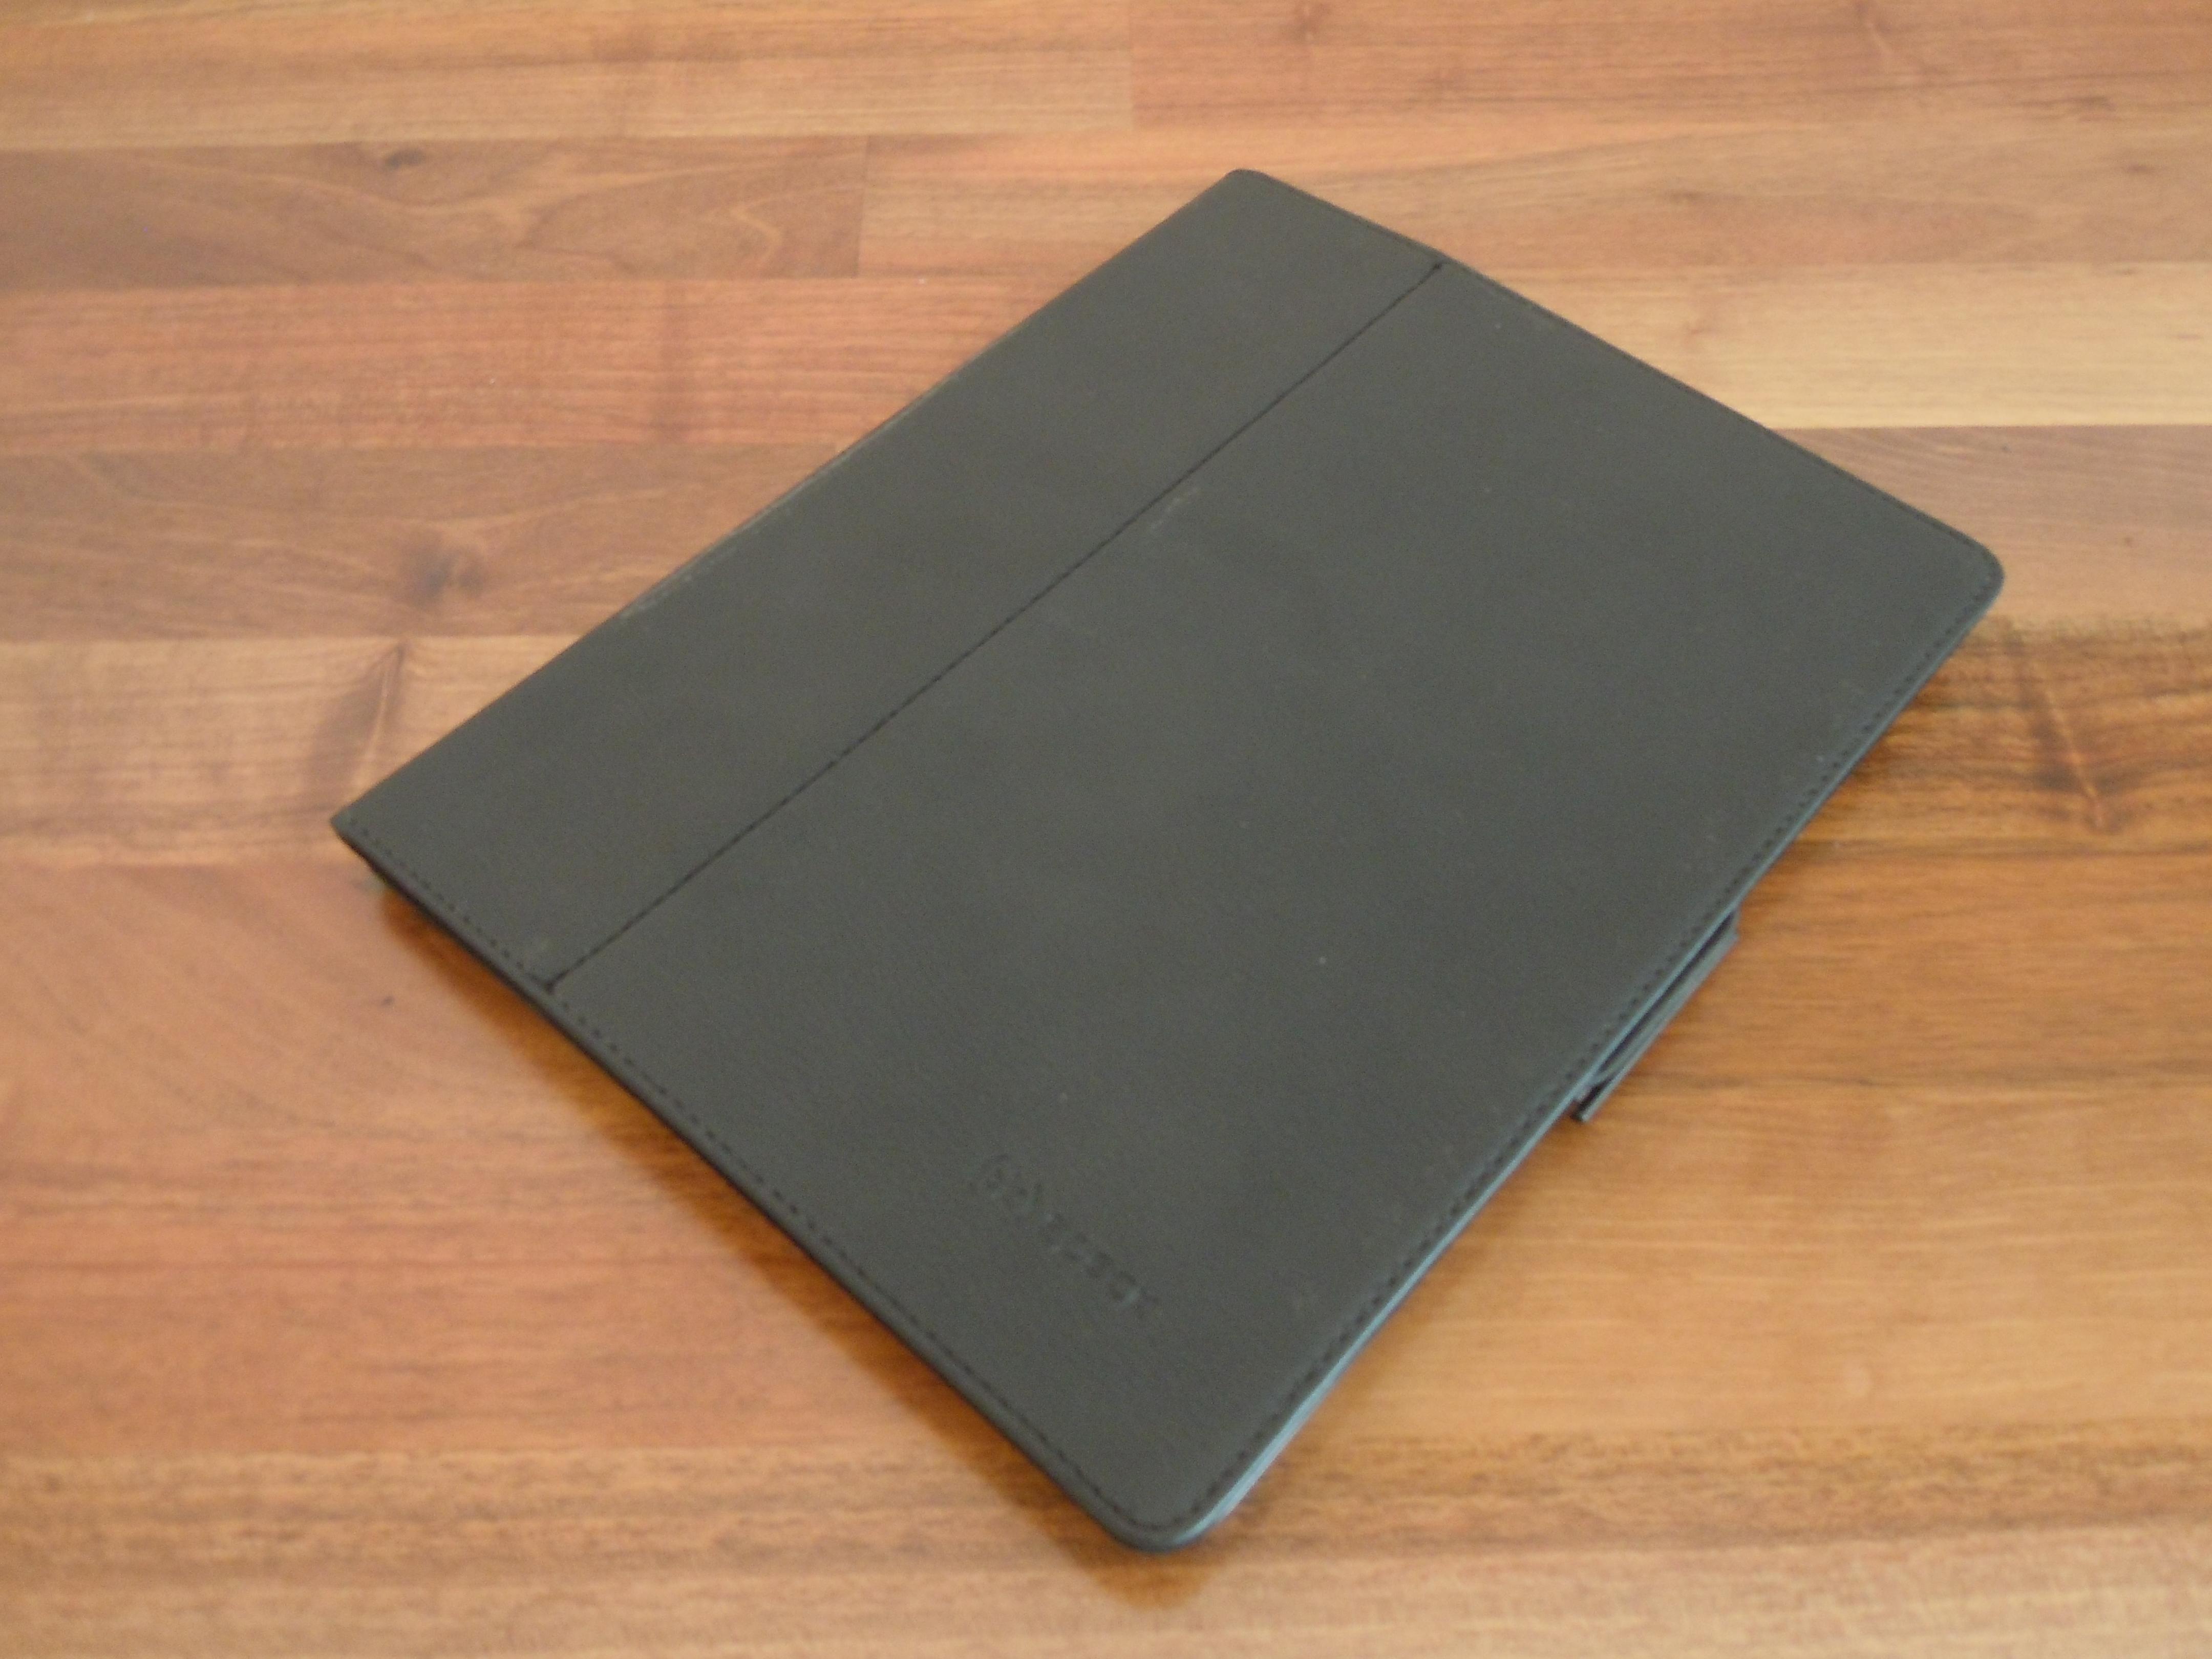 Recensione Speck Fit Folio per iPad 2